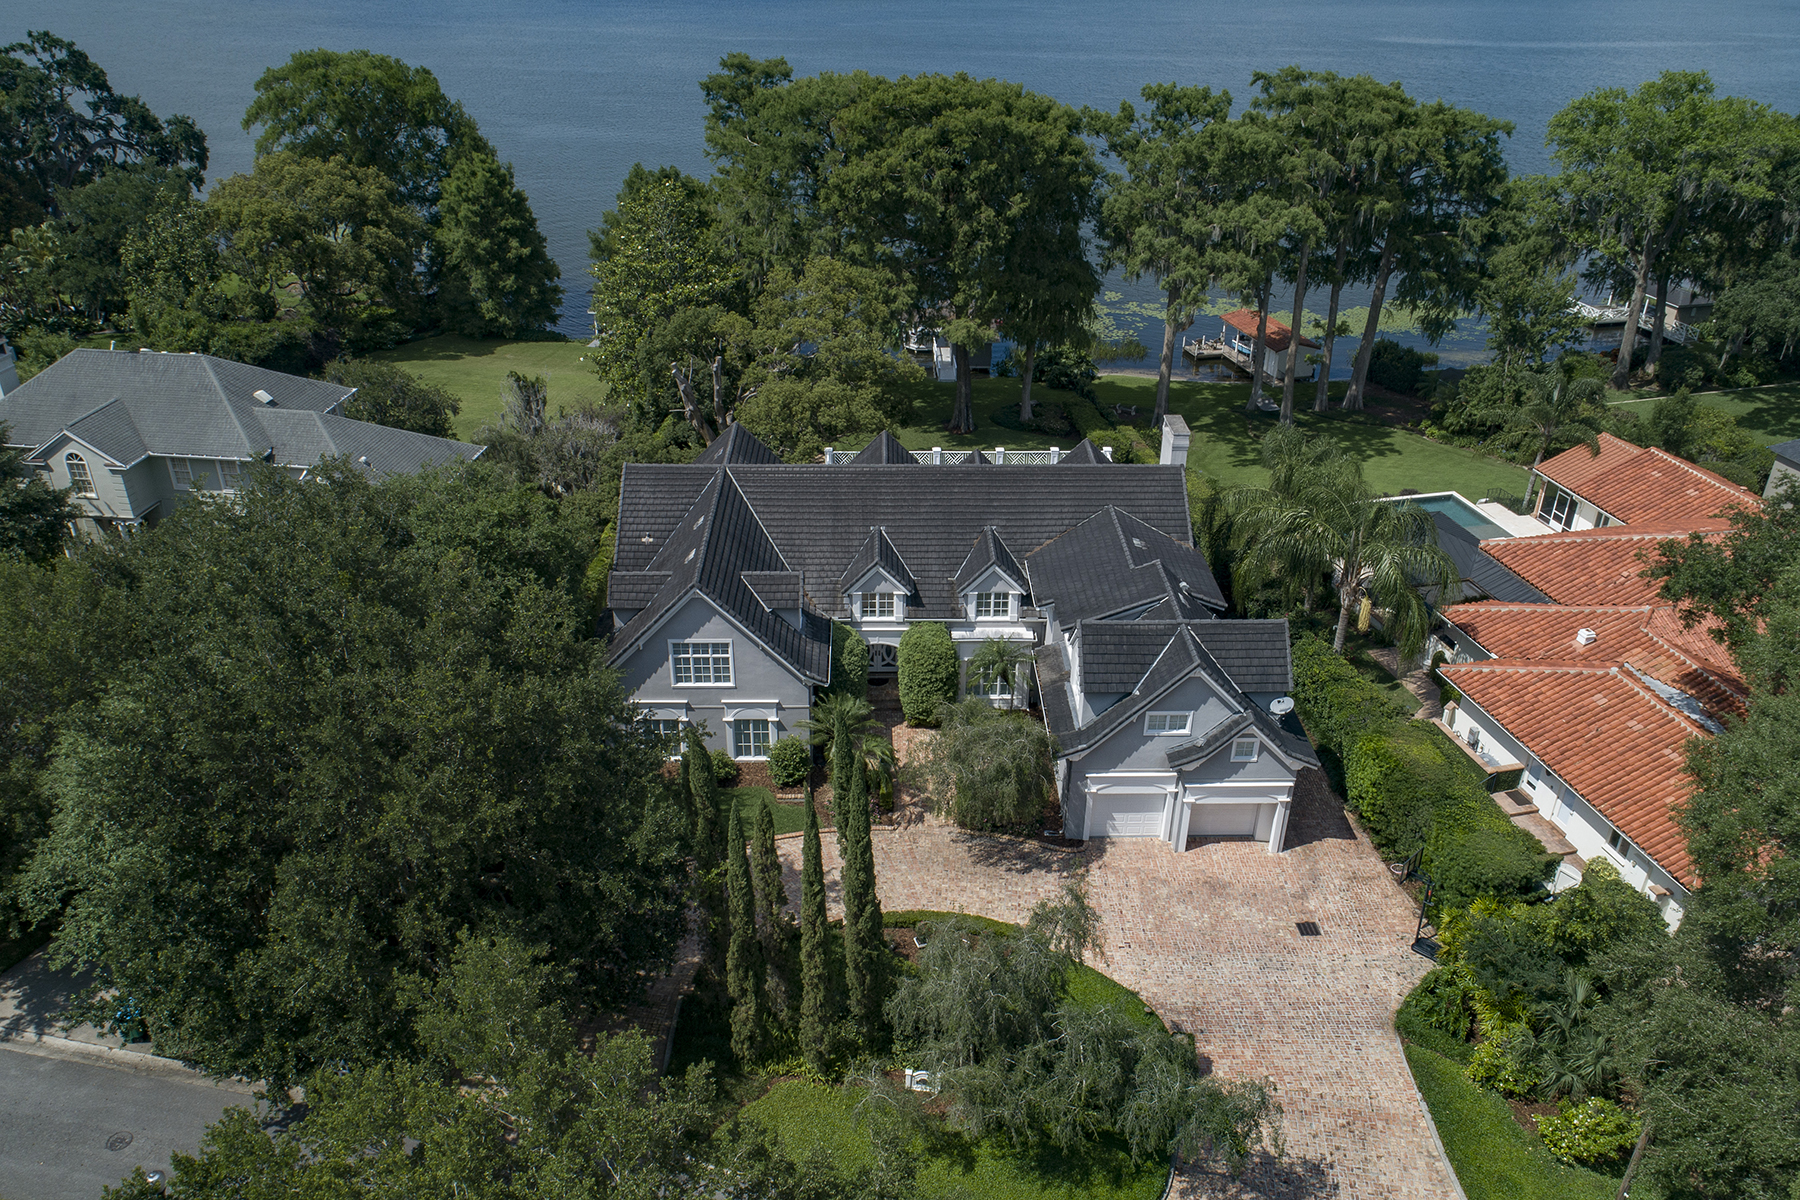 Single Family Homes por un Venta en WINTER PARK 375 Virginia Dr, Winter Park, Florida 32789 Estados Unidos